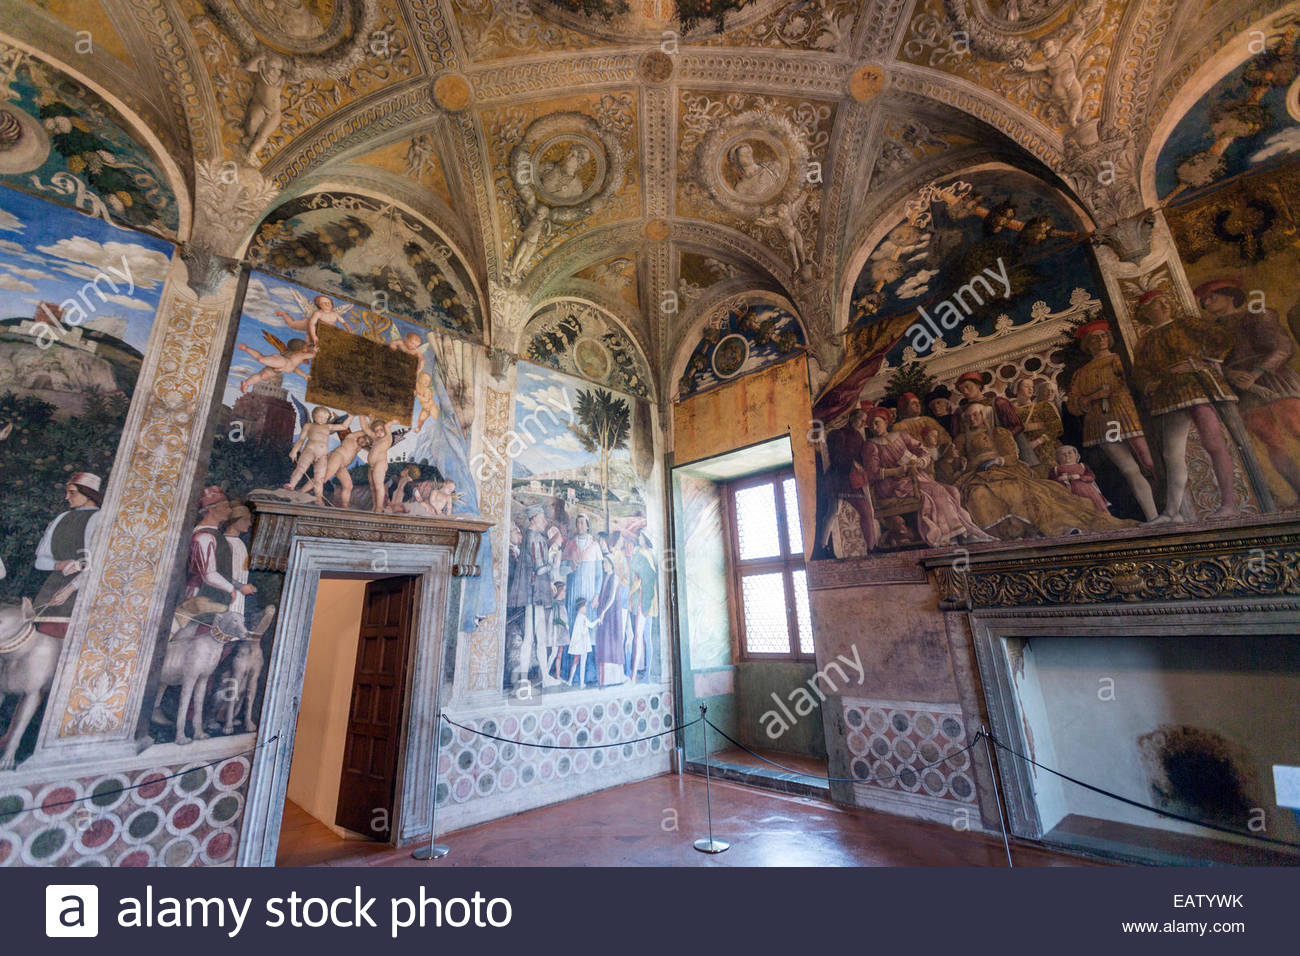 Camera degli sposi ducal palace with frescoes executed for Degli sposi